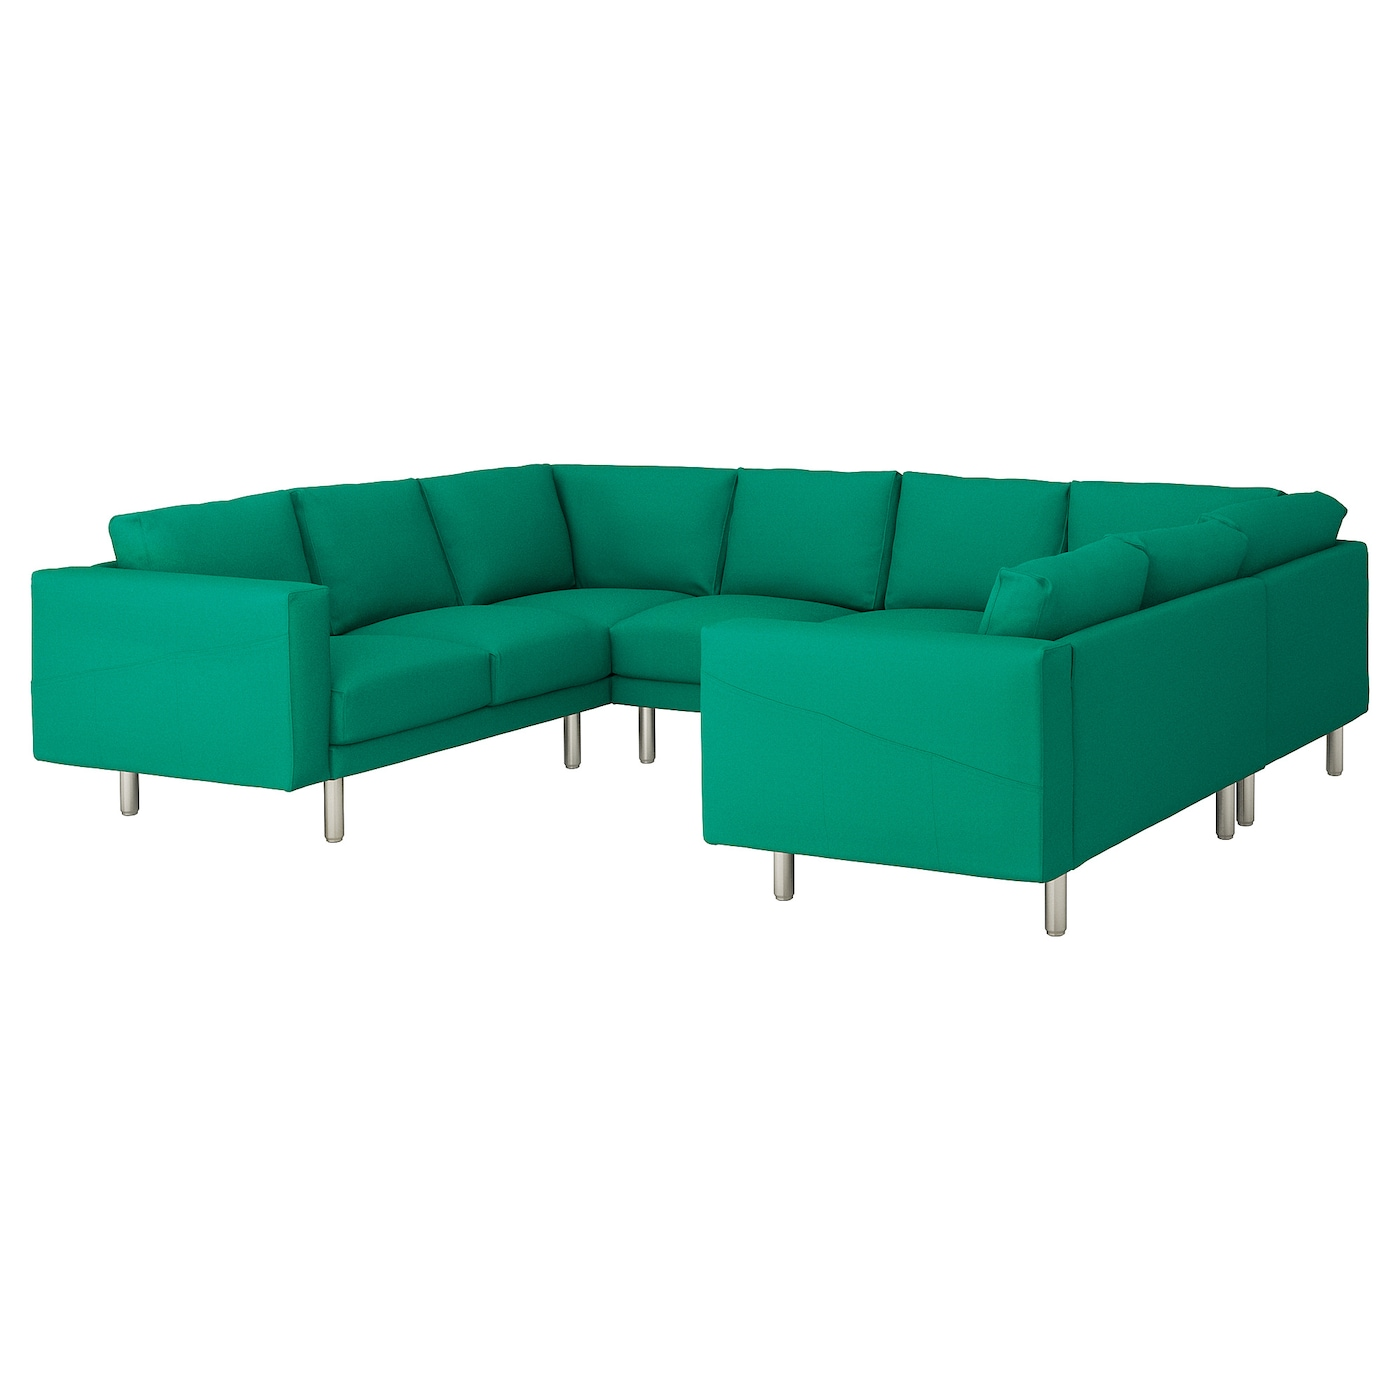 Modular sectional sofas ikea ireland for U shaped sectional sofa ikea